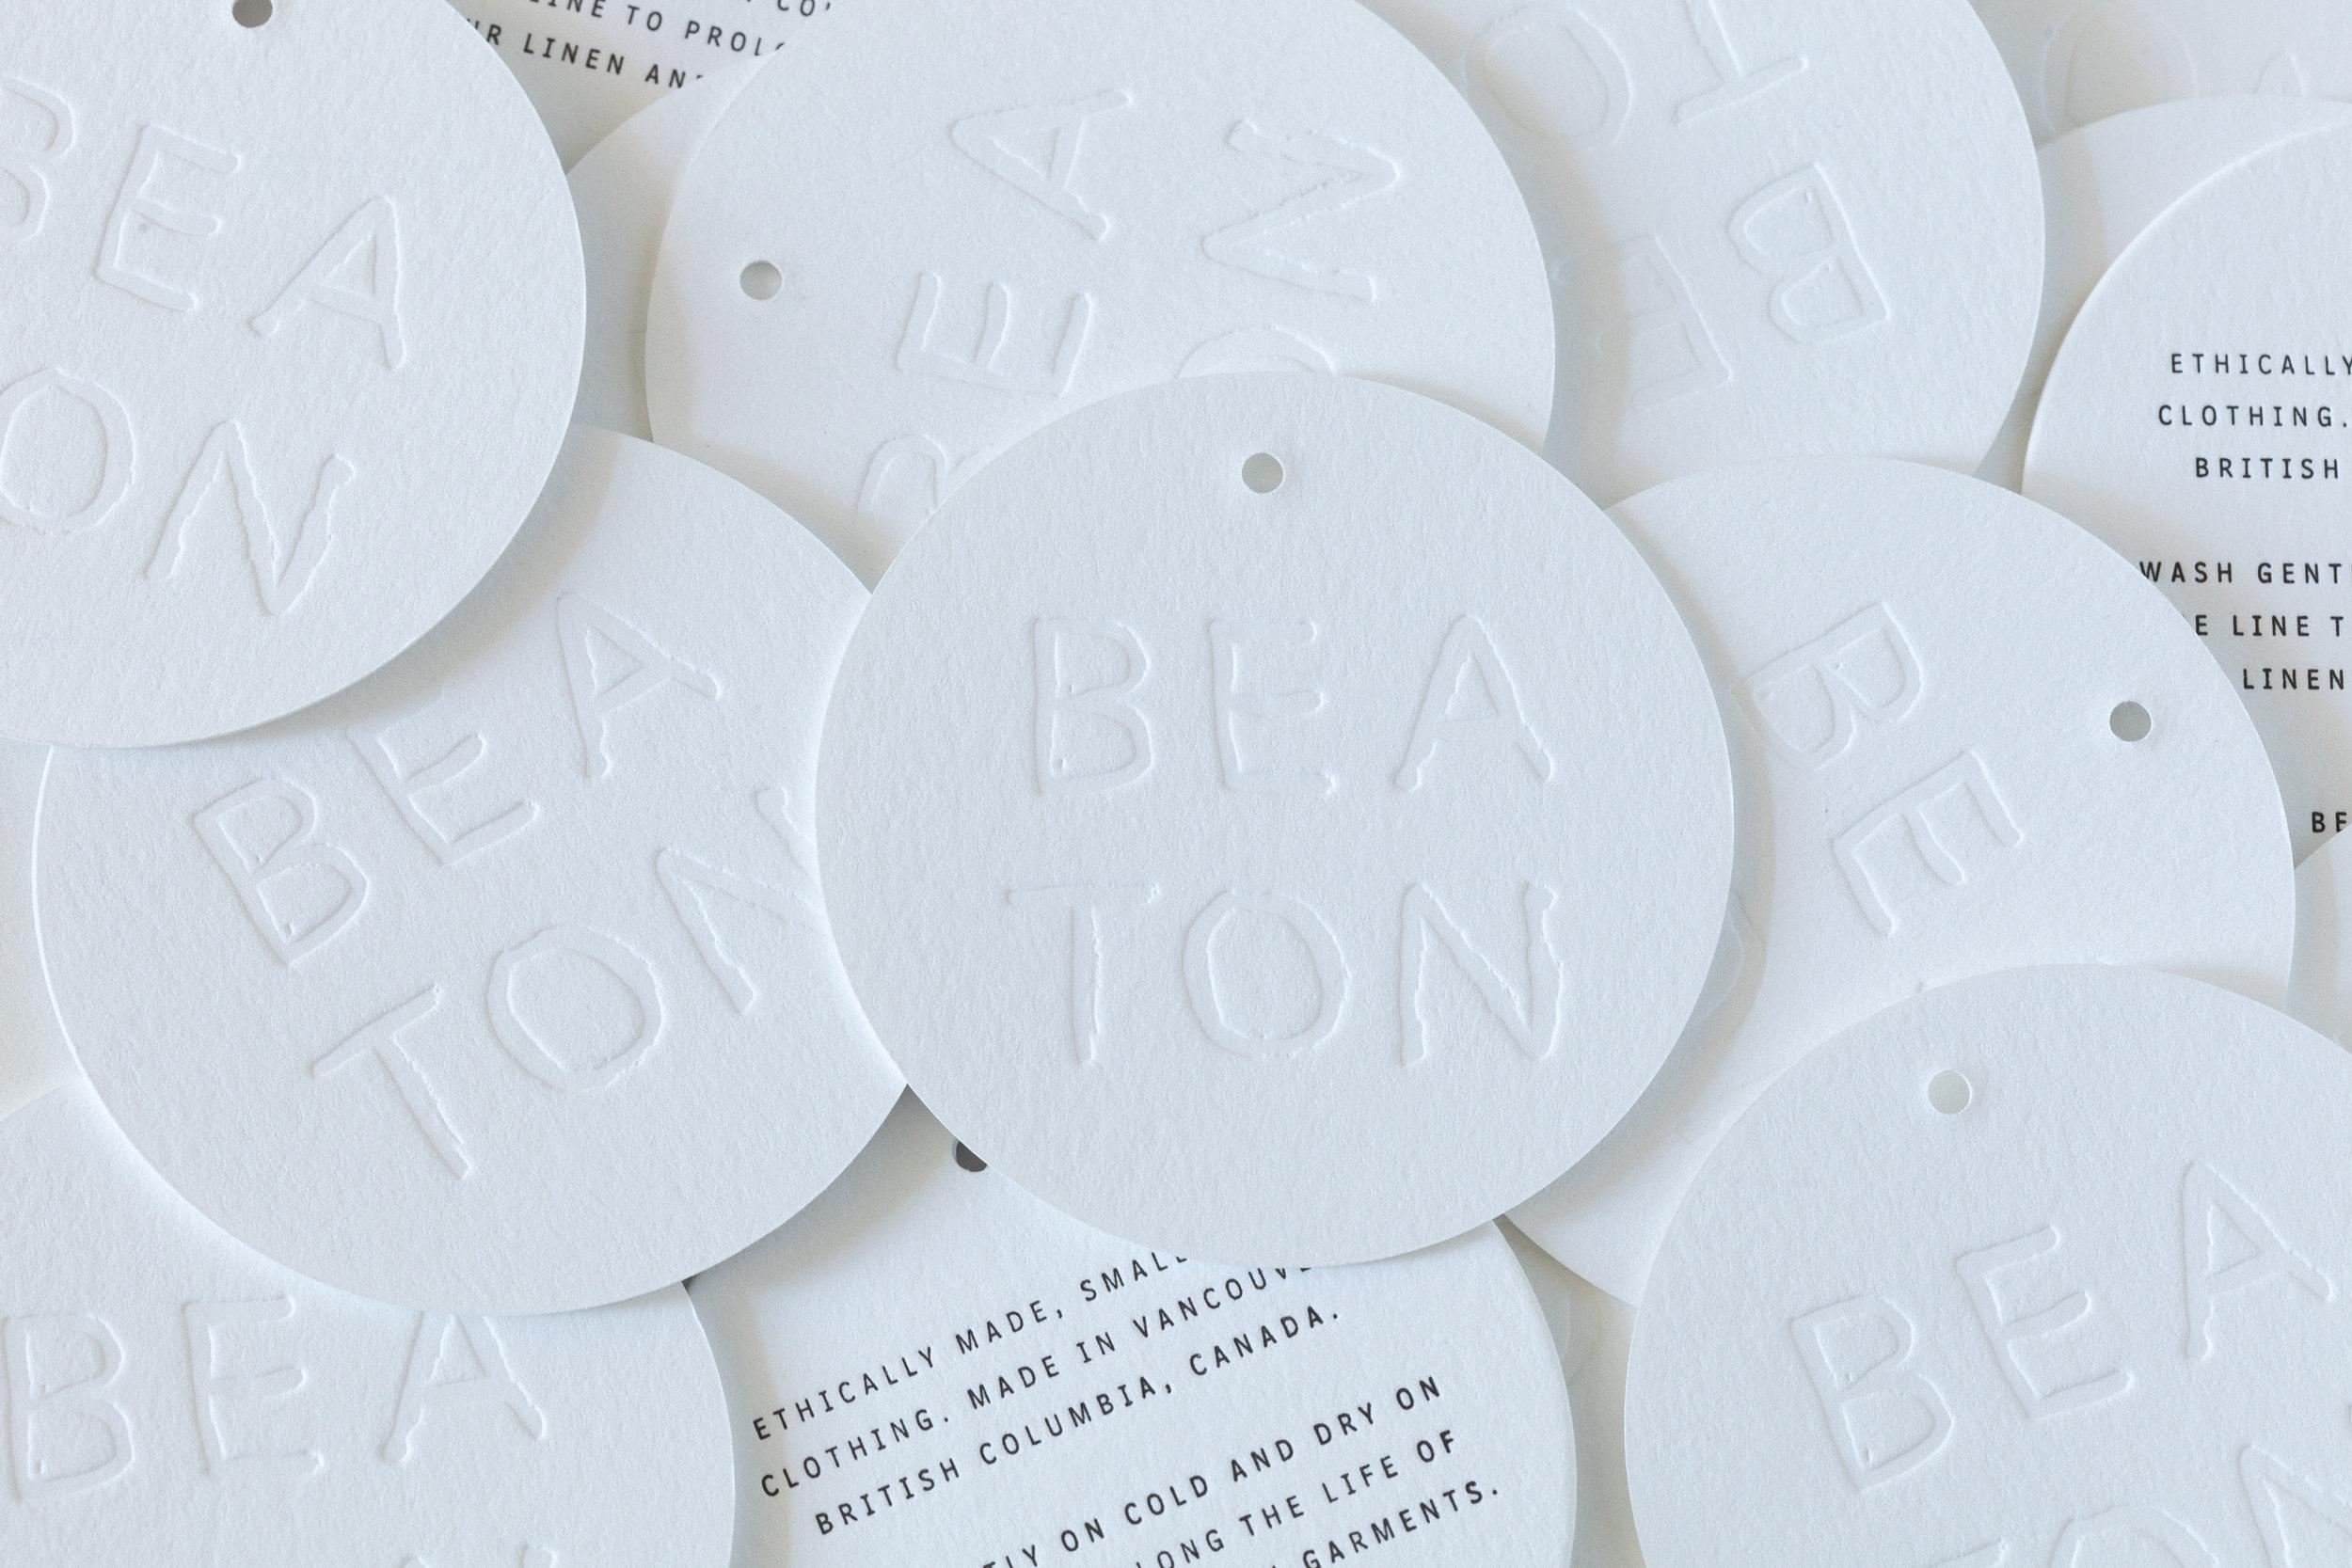 Custom letterpress printed Hang tags